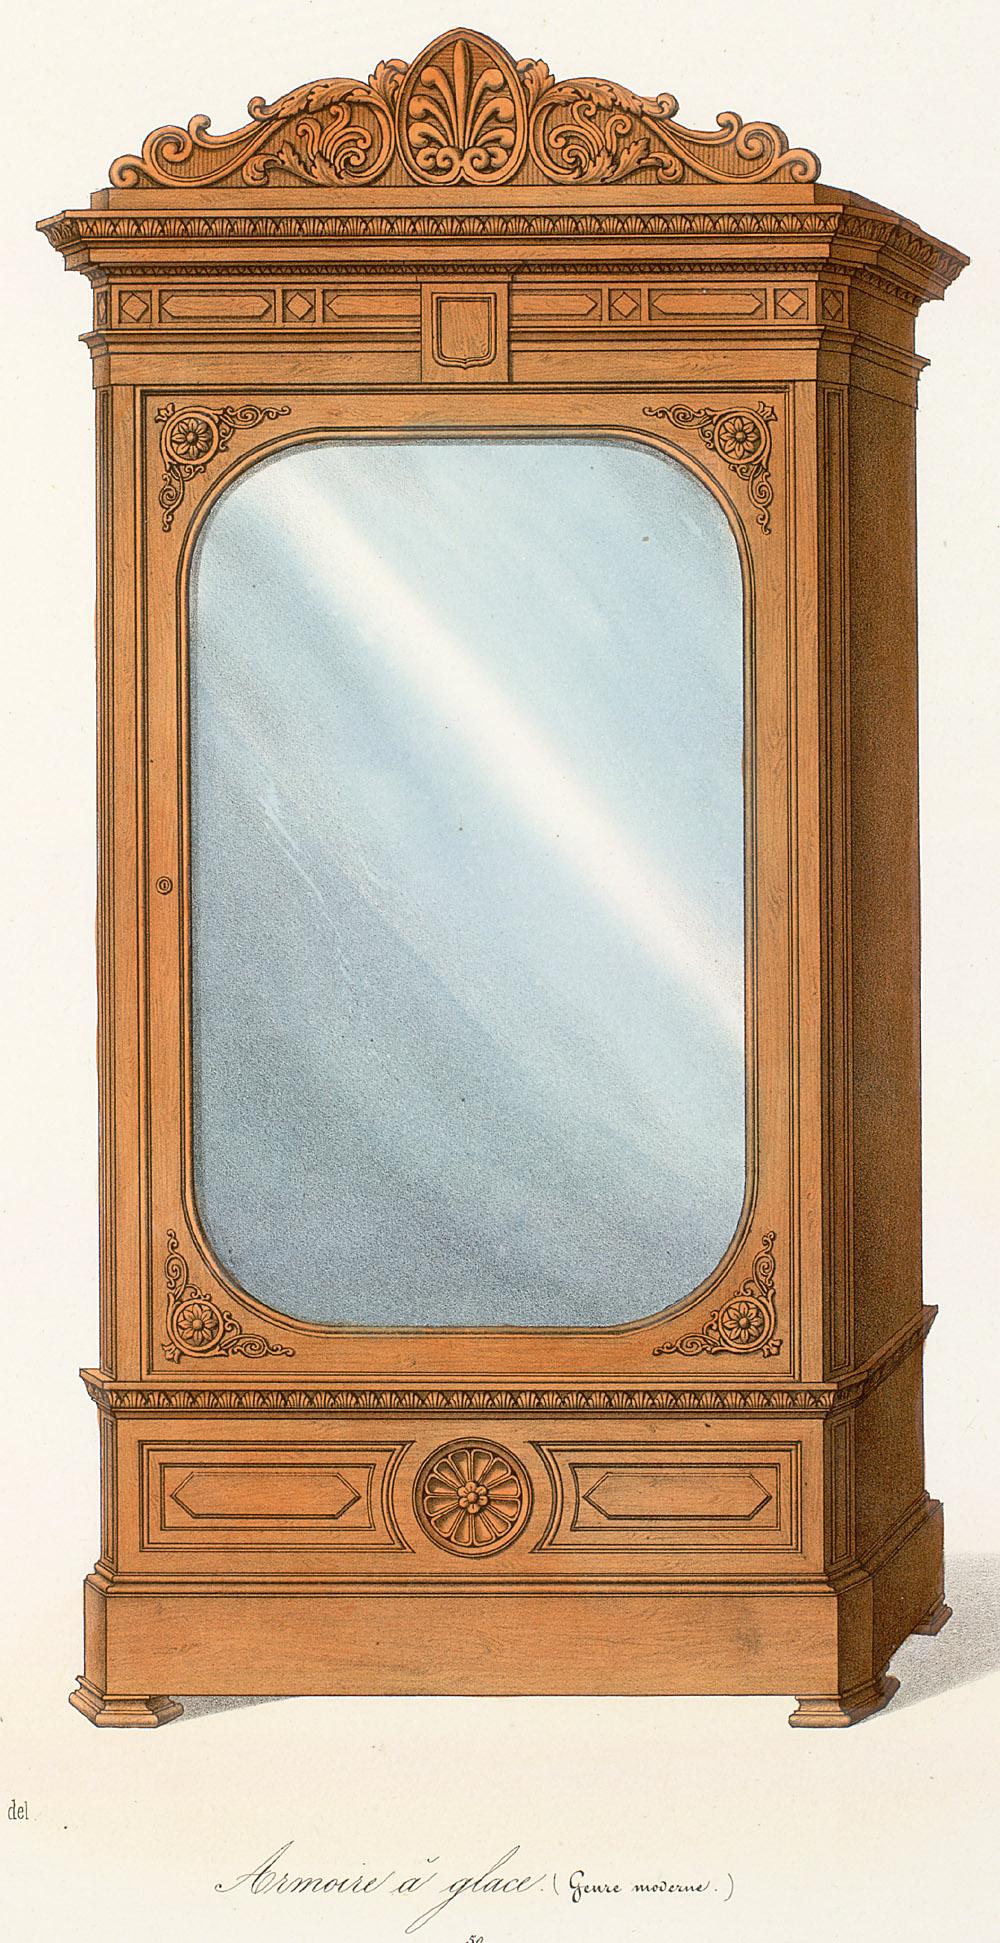 Cabinets (case furniture),  Image number:SIL12-2-336b